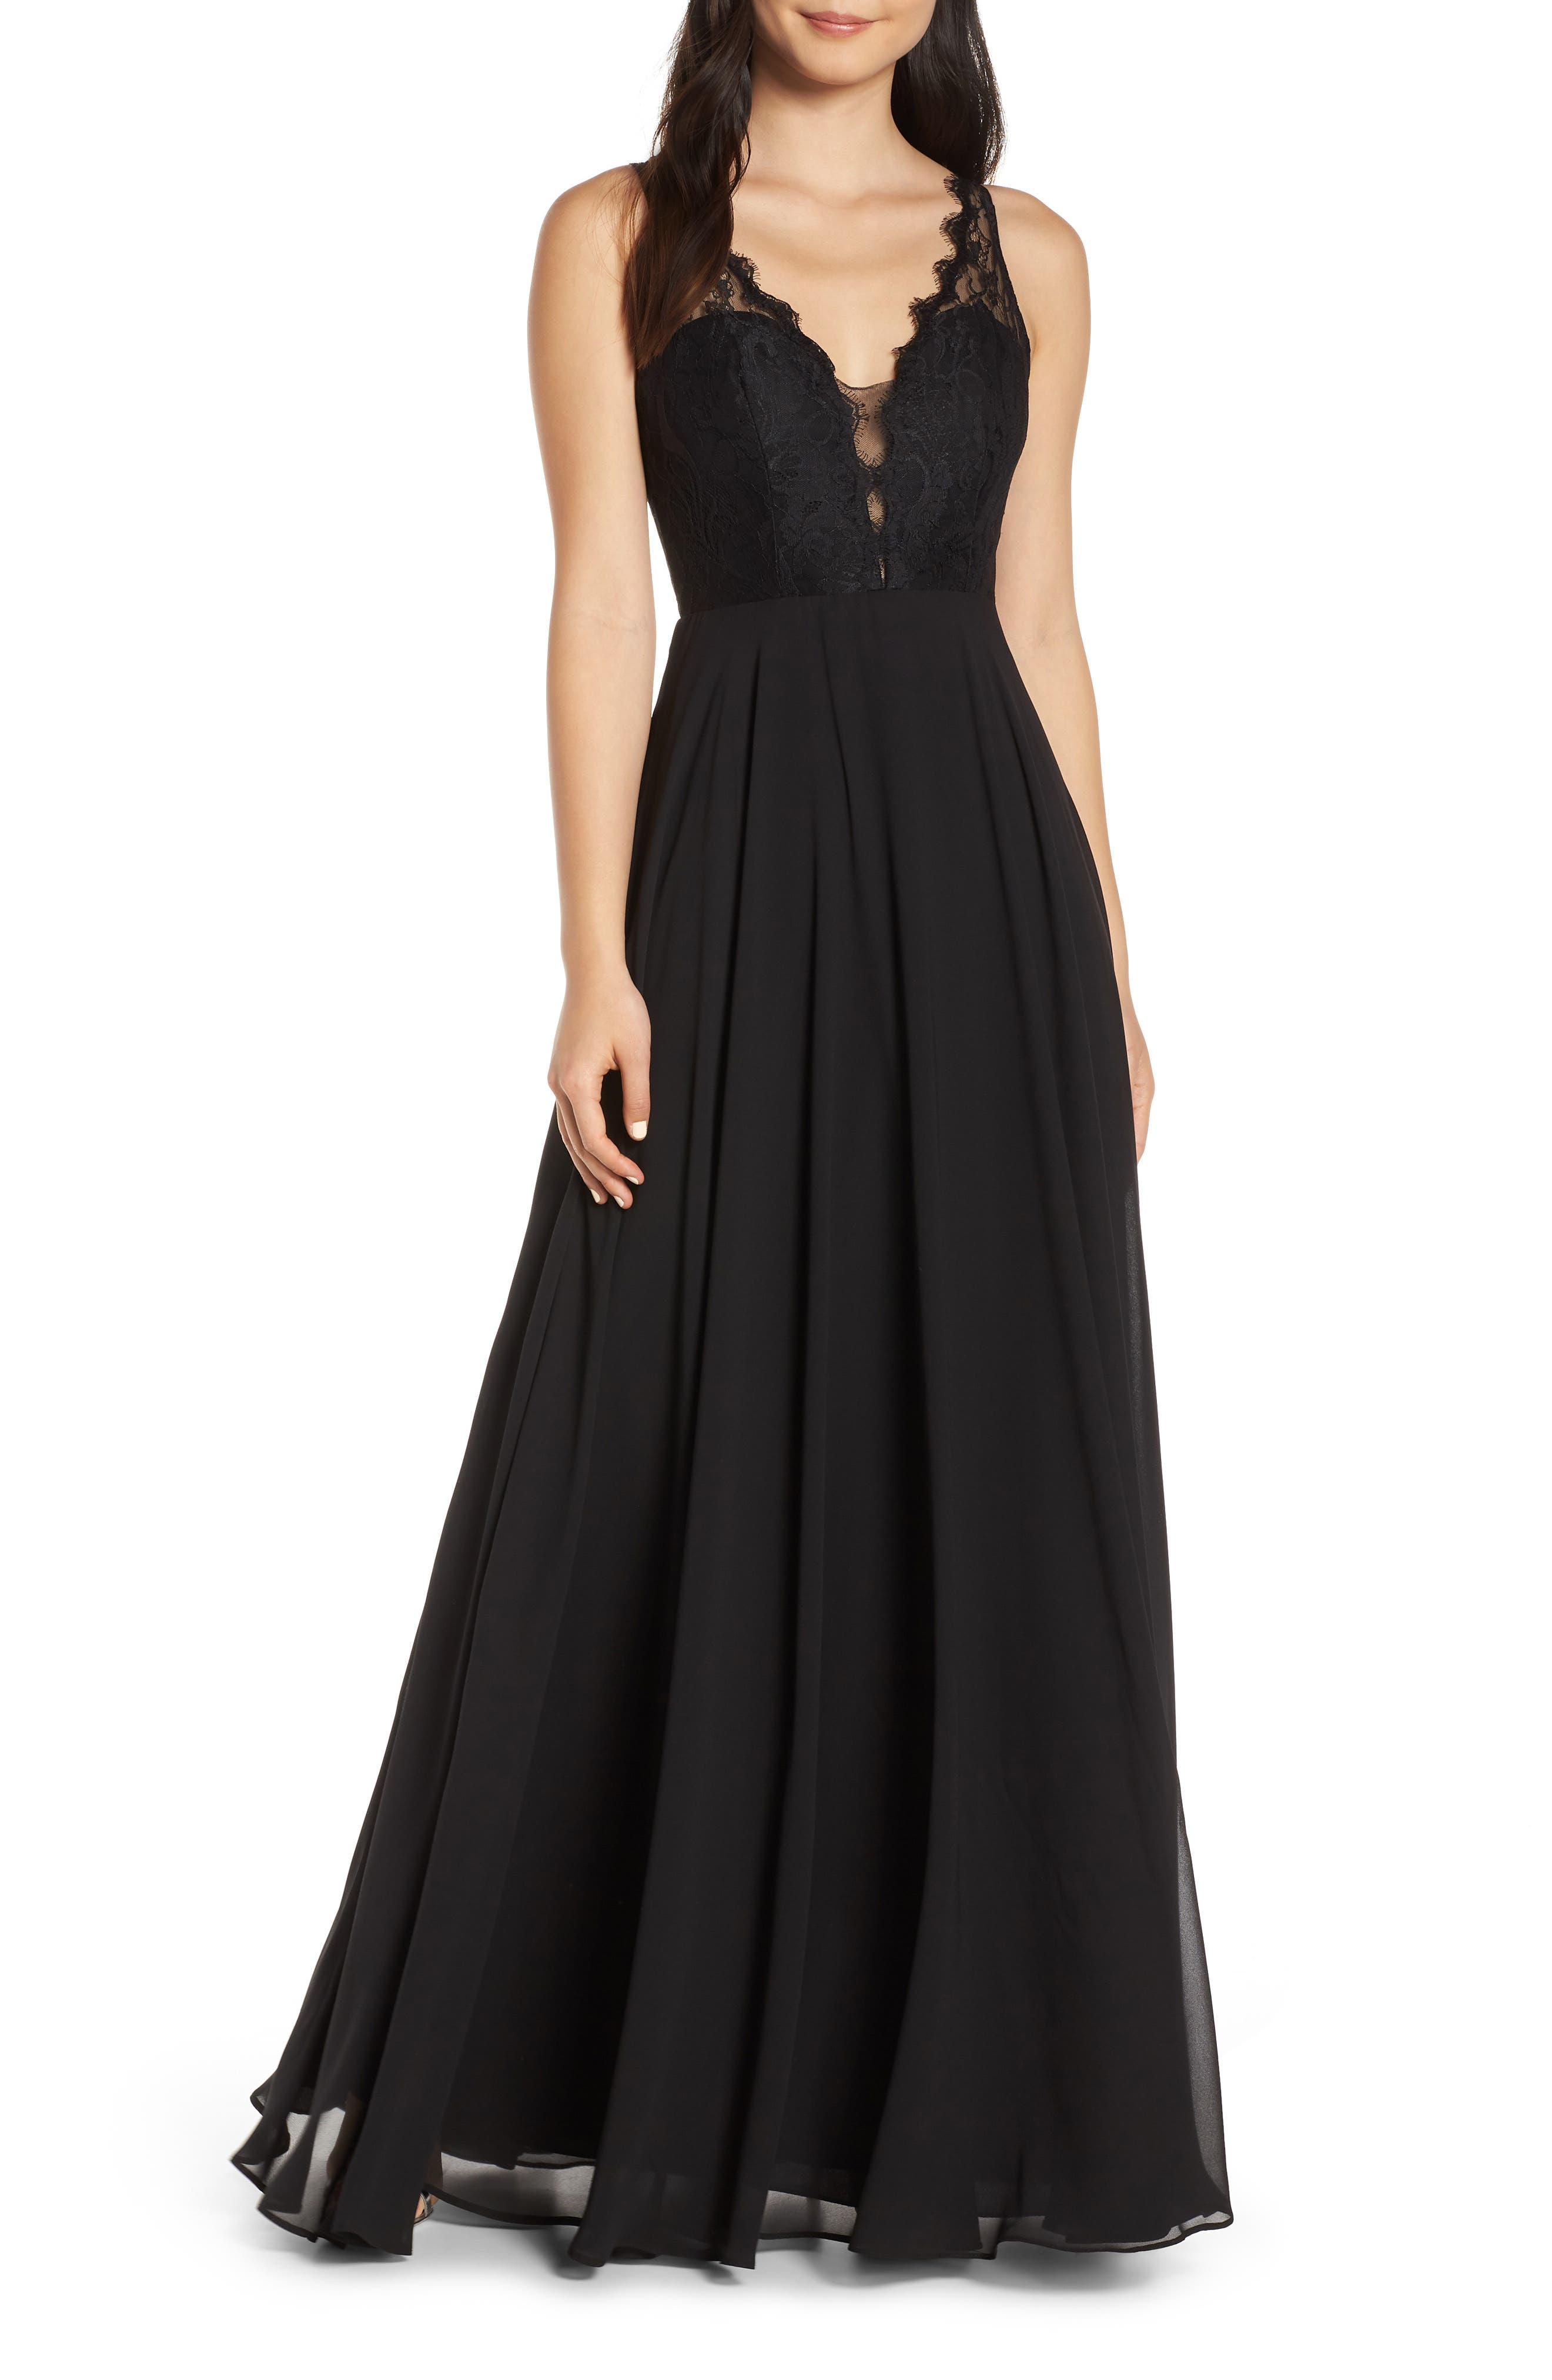 Hayley Paige Occasions Lace Bodice Chiffon Evening Dress, Black